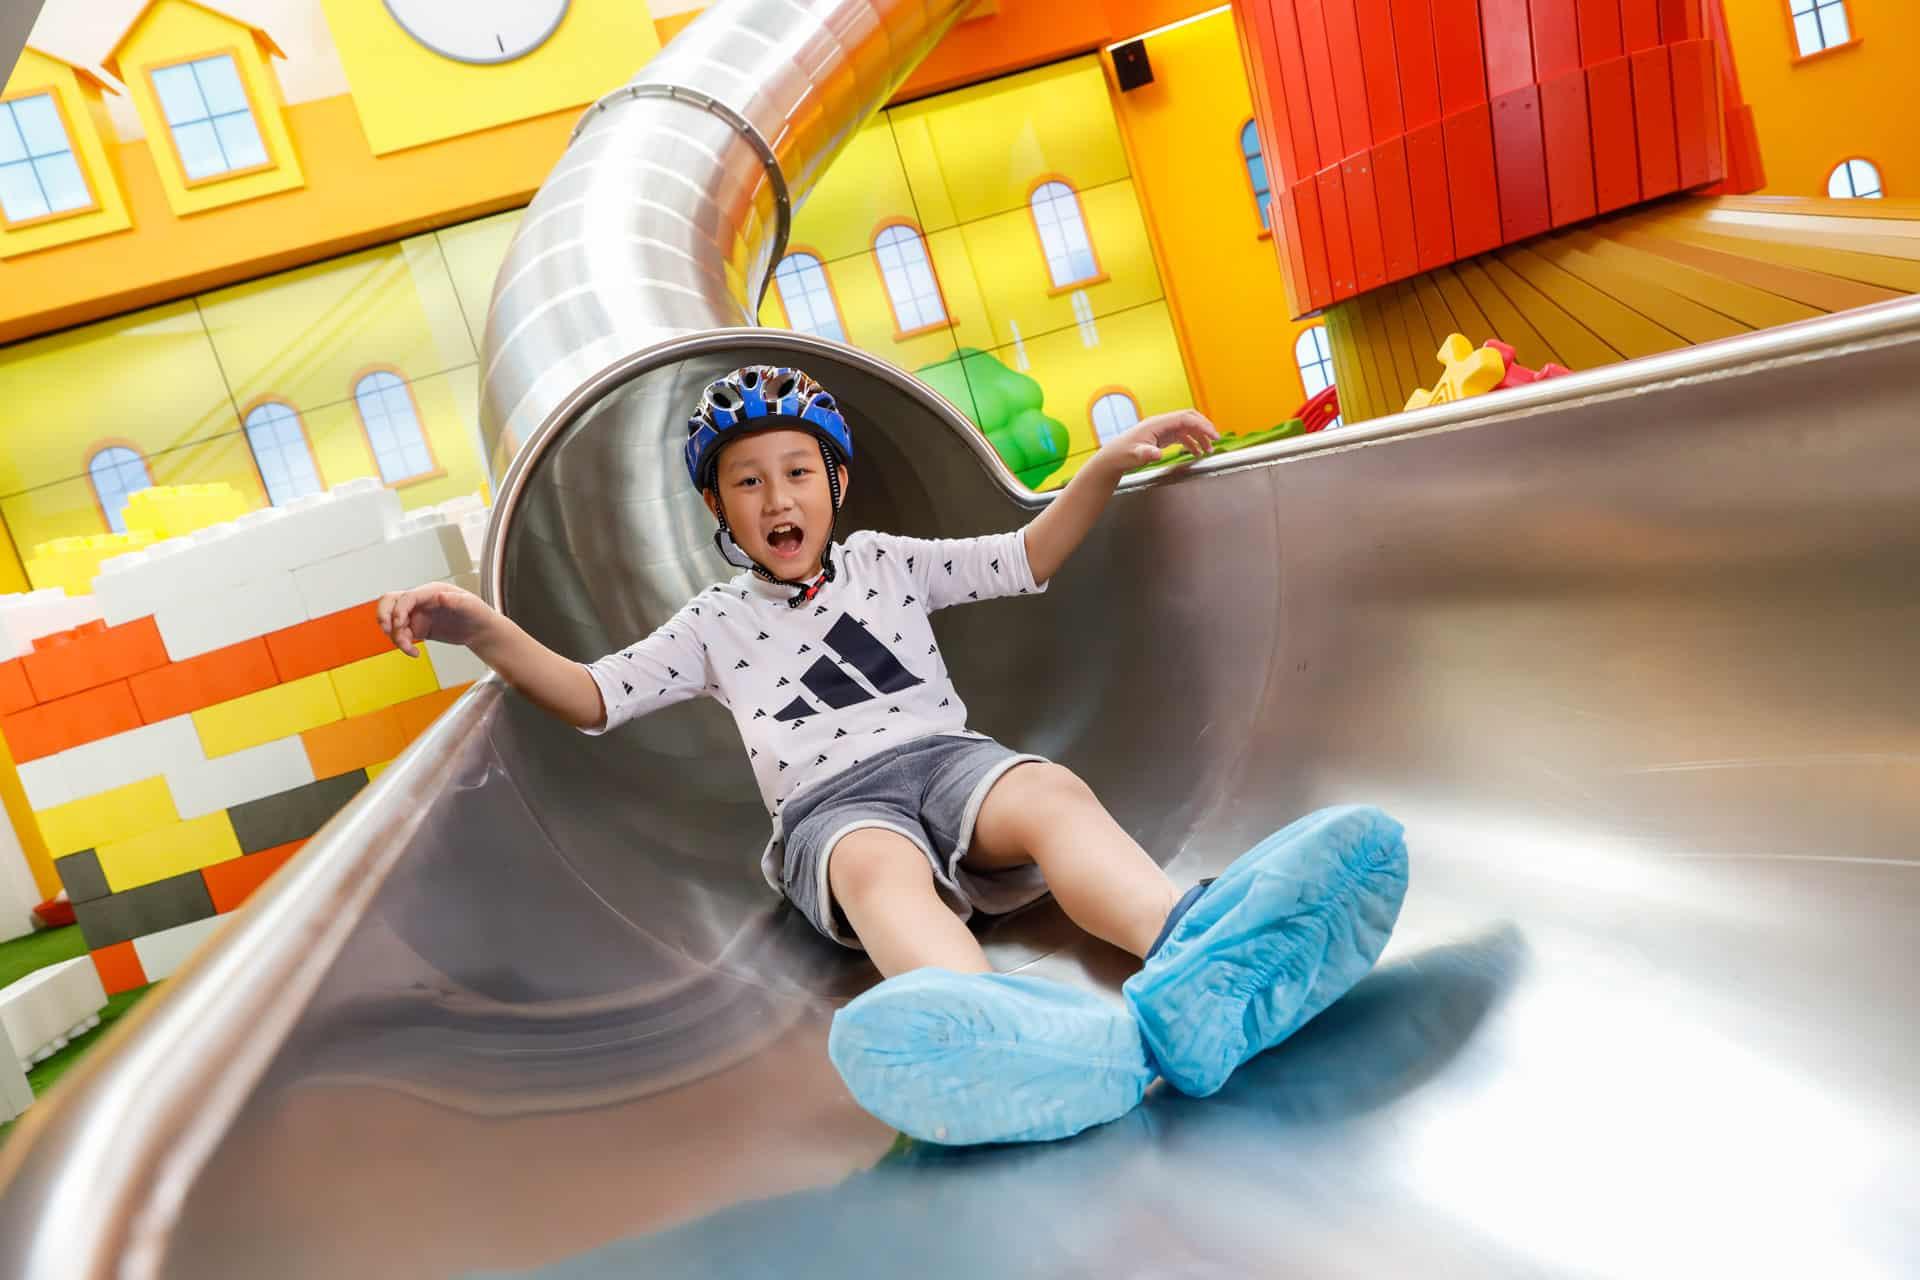 K11 MUSEA:Donut Playhouse夏日兒童嘉年華 巨型室內造型滑梯 Happy Mega Slide